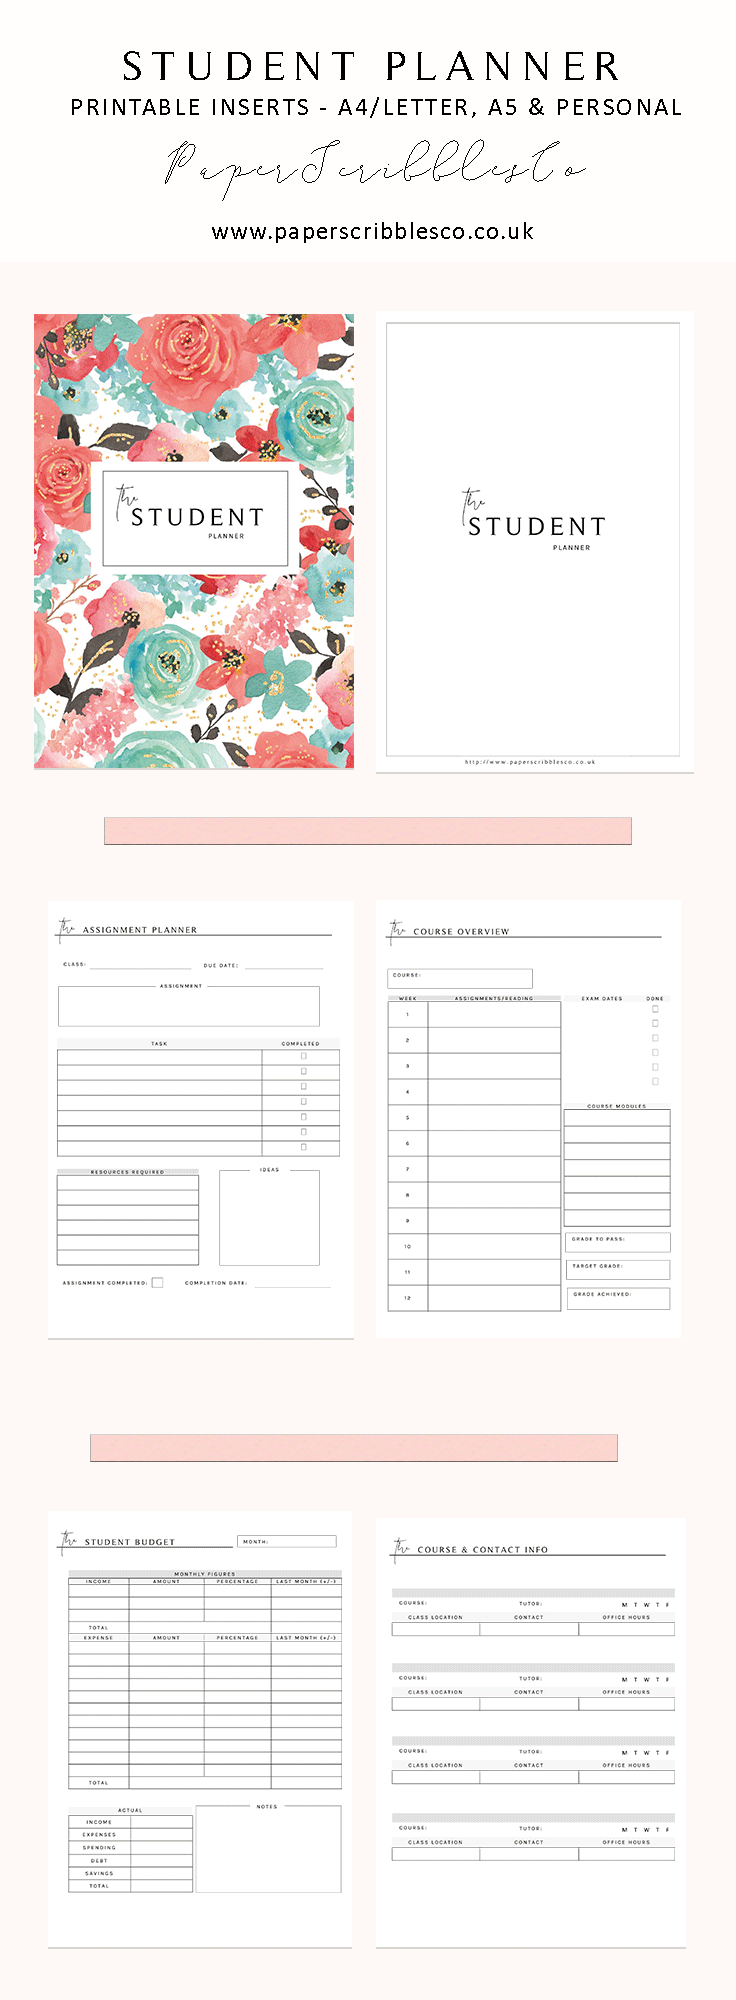 student planner school planner academic planner printable 2018